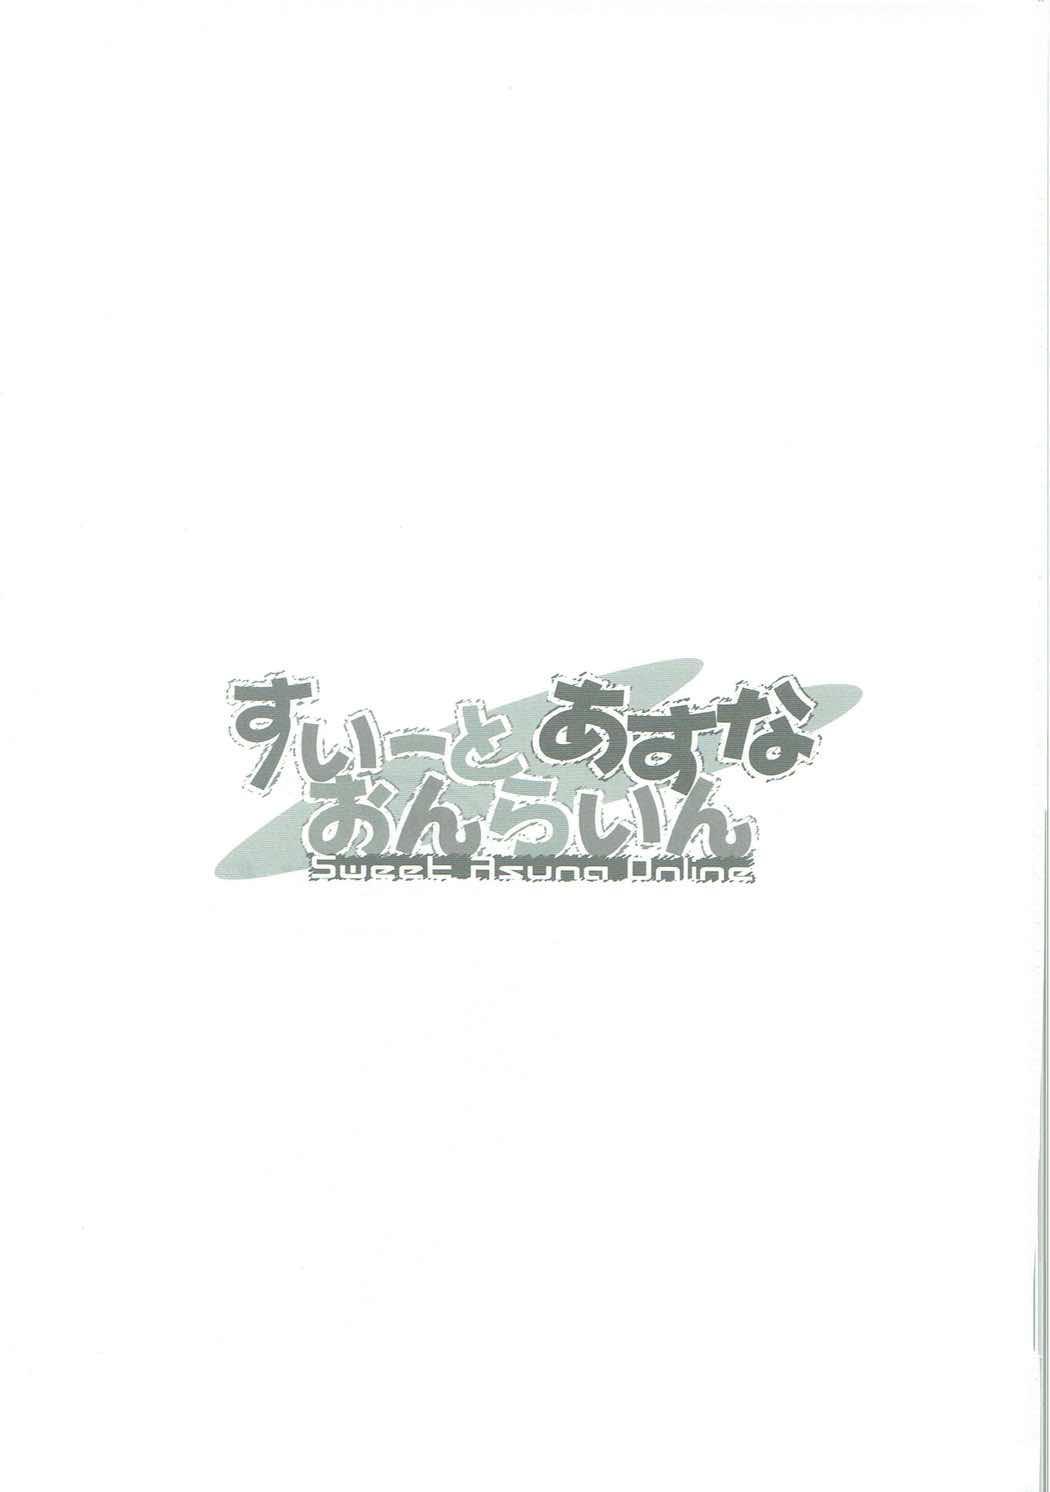 Sweet Asuna Online 1